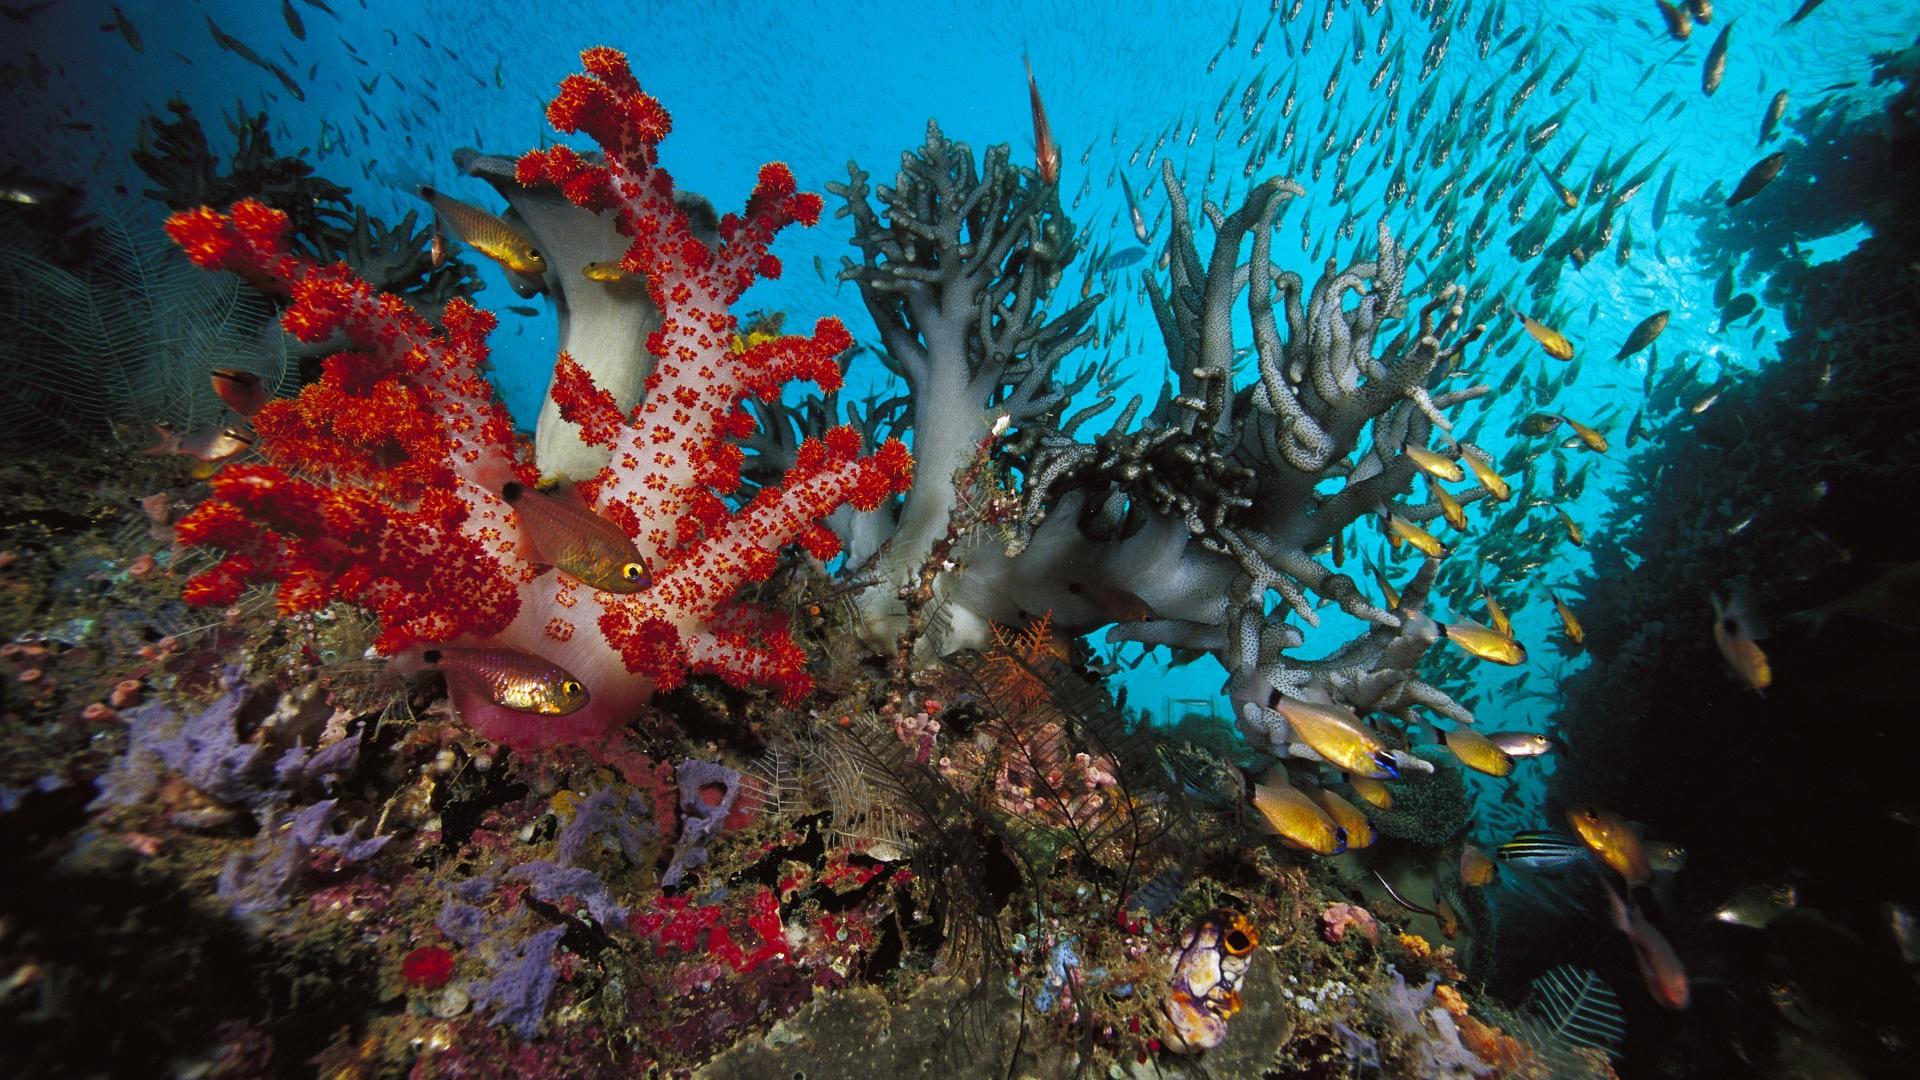 Sea Life Hd Wallpaper Background Image 1920x1080 Id 190965